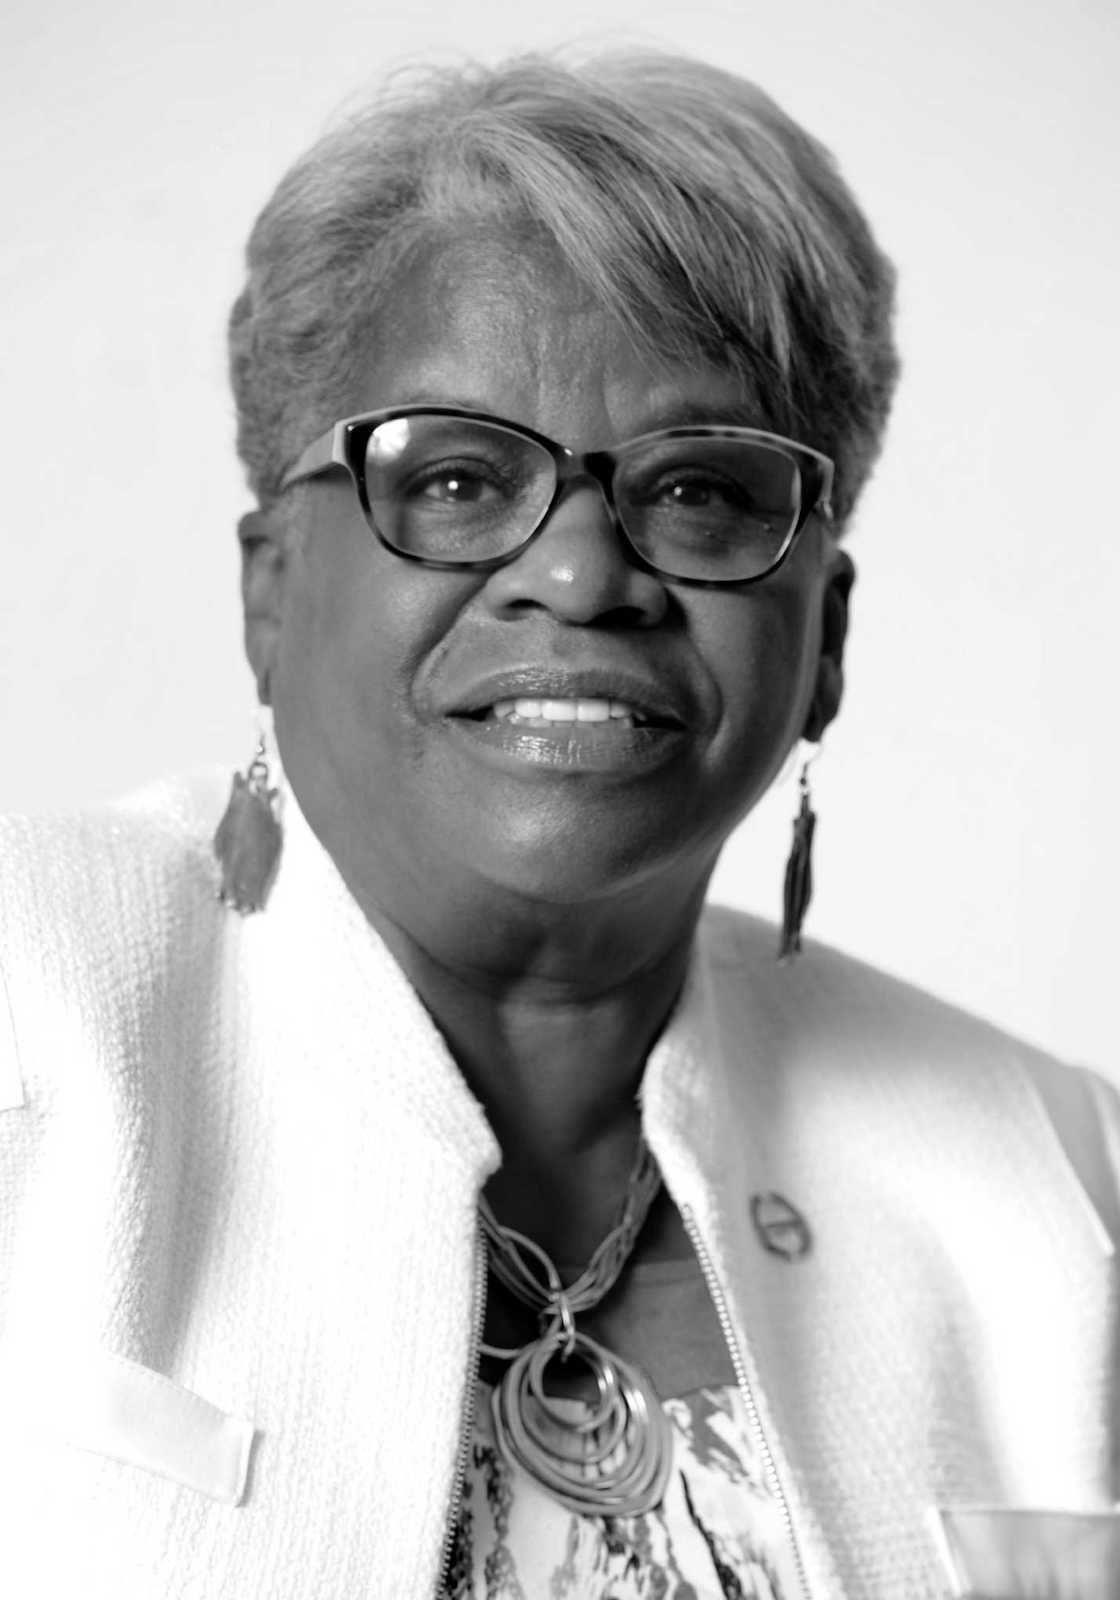 Marilyn Moore, Willoughby Avenue, The Five Fifths, KOLUMN Magazine, KOLUMN, African American Politics, Black in Politics